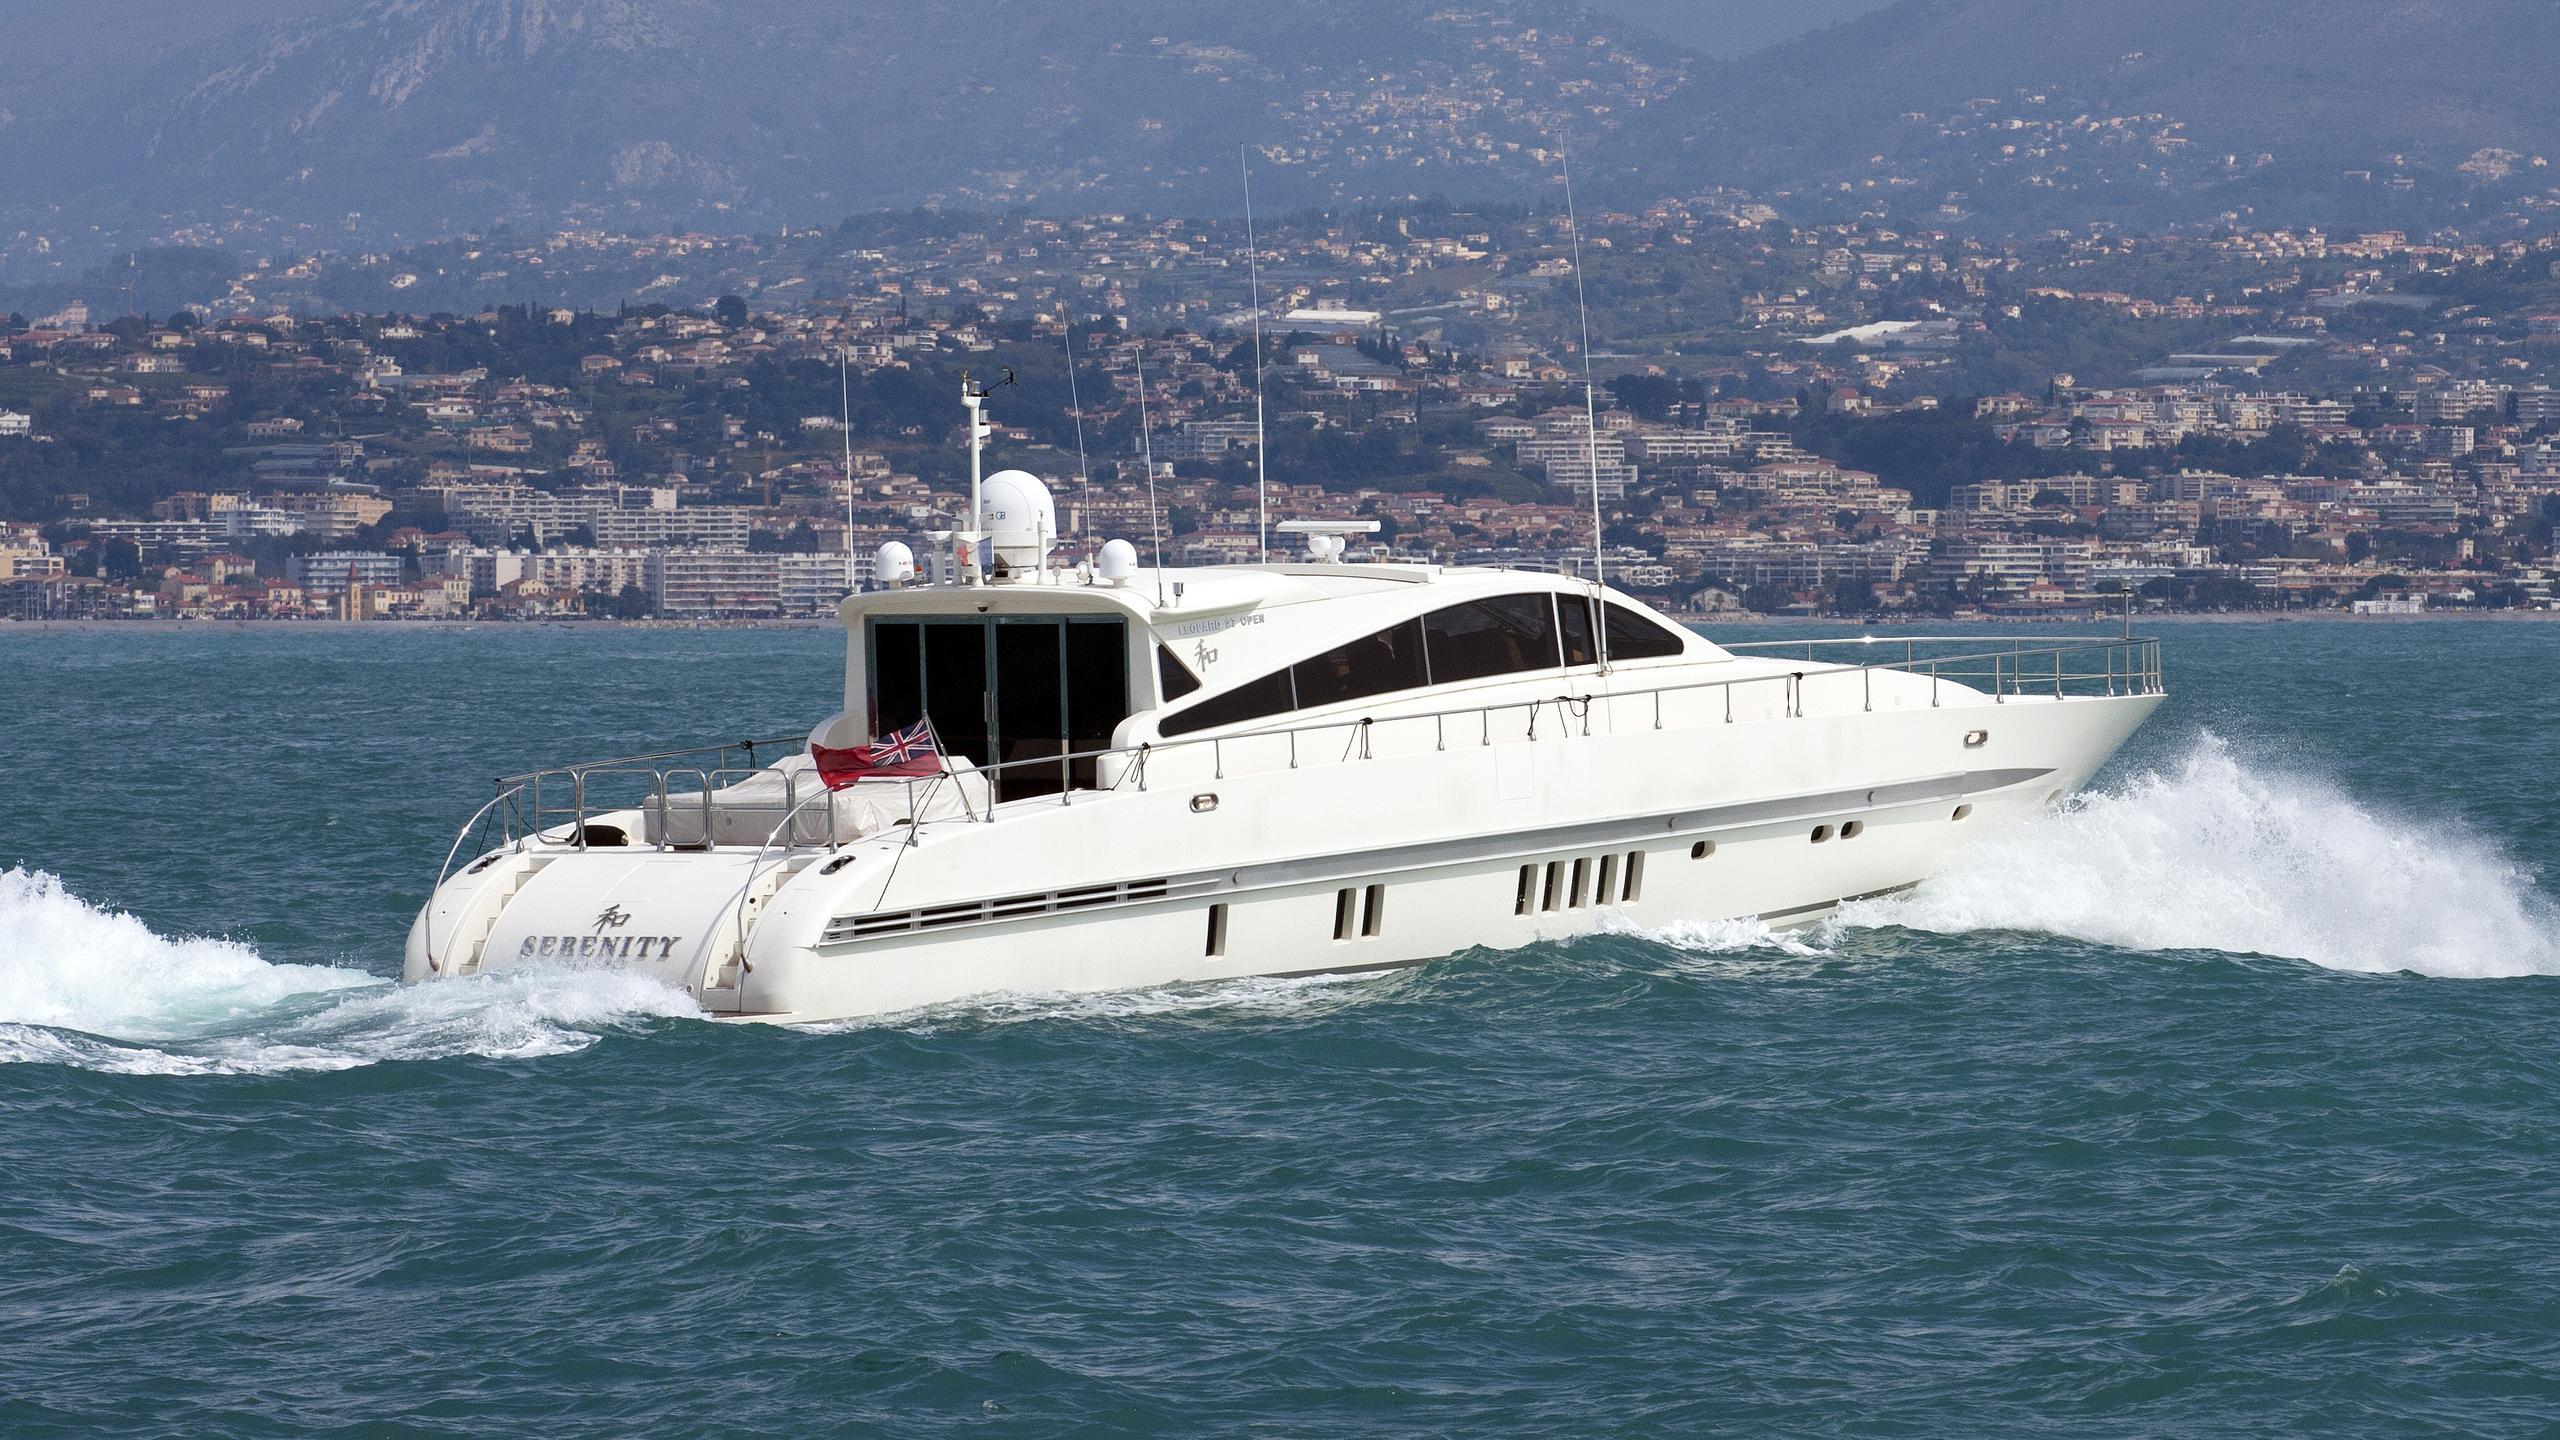 serenity-atlantic-motor-yacht-arno-leopard-27-sport-2005-27m-half-profile